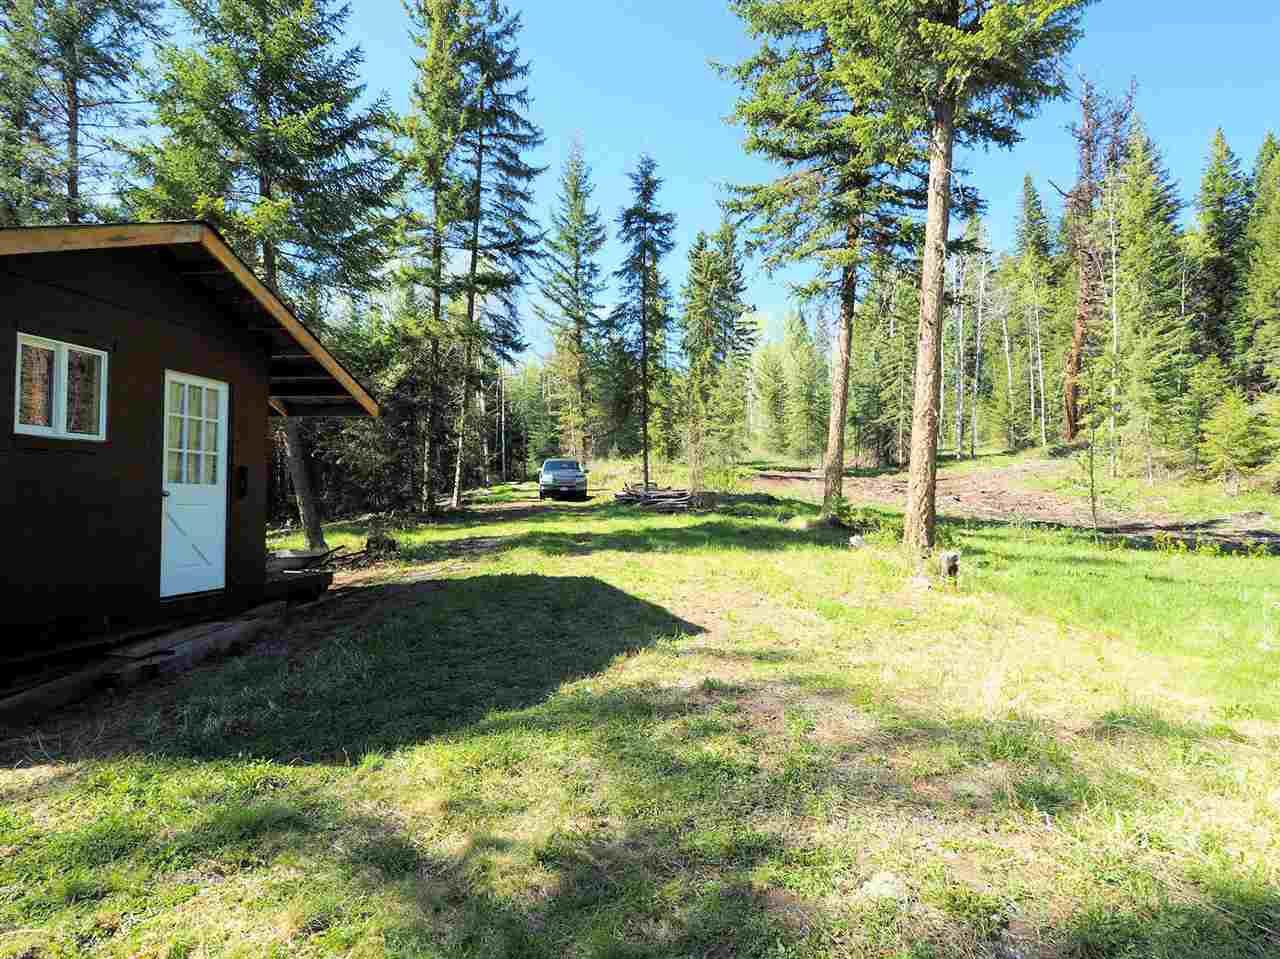 Photo 28: Photos: 8222 CENTENNIAL Road in Bridge Lake: Bridge Lake/Sheridan Lake House for sale (100 Mile House (Zone 10))  : MLS®# R2457362